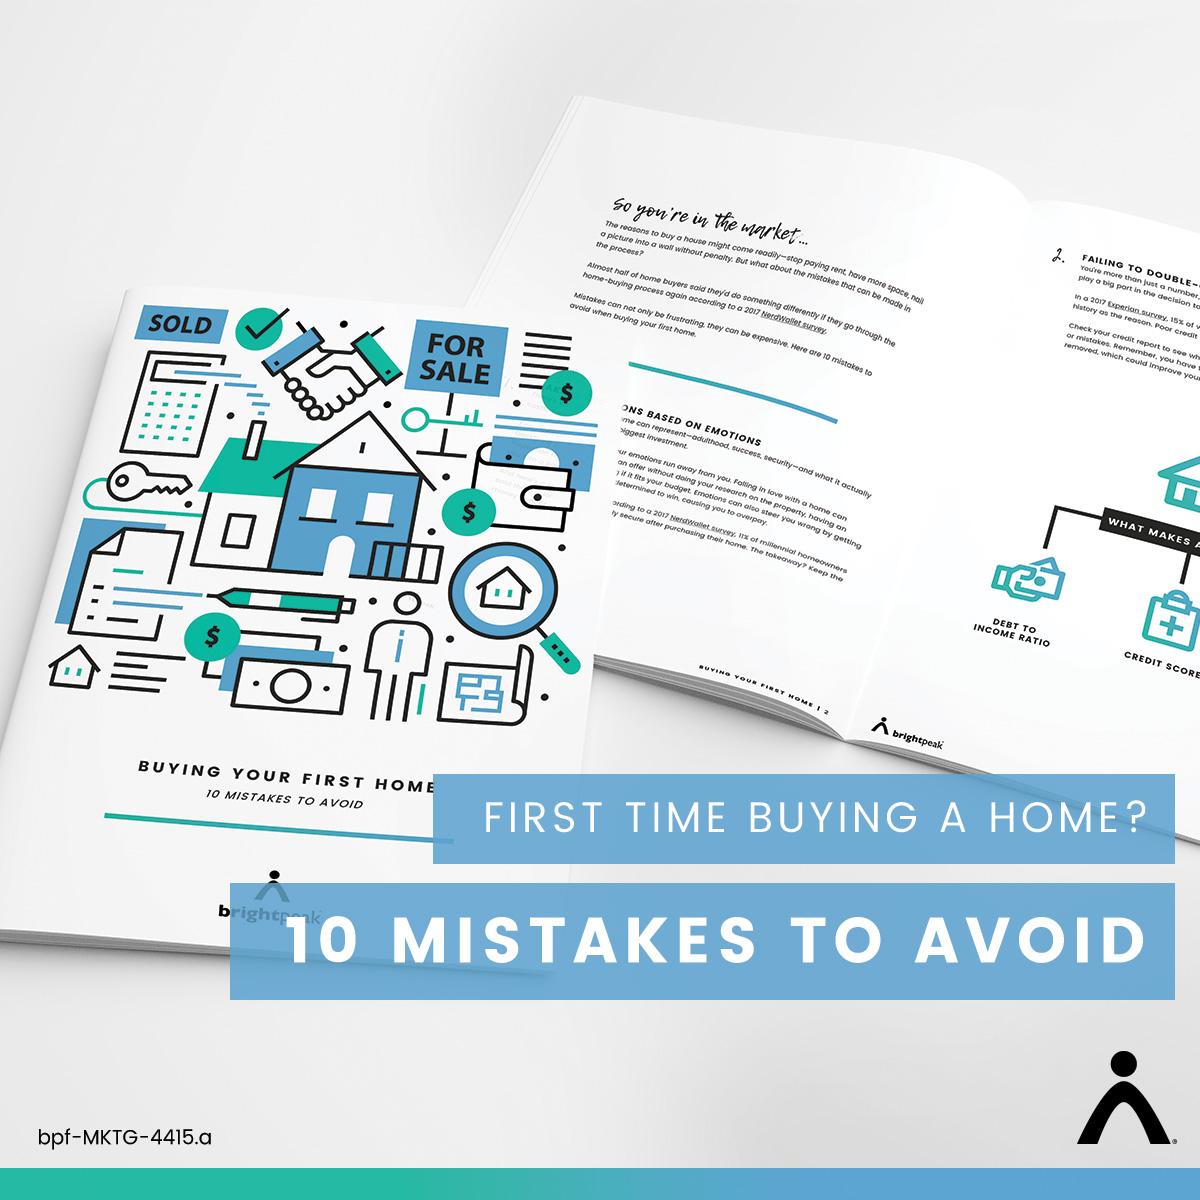 bp_firsthomeprobs-homebuying-guide_INSTA-ad_bpf-MKTG-4415-b.jpg